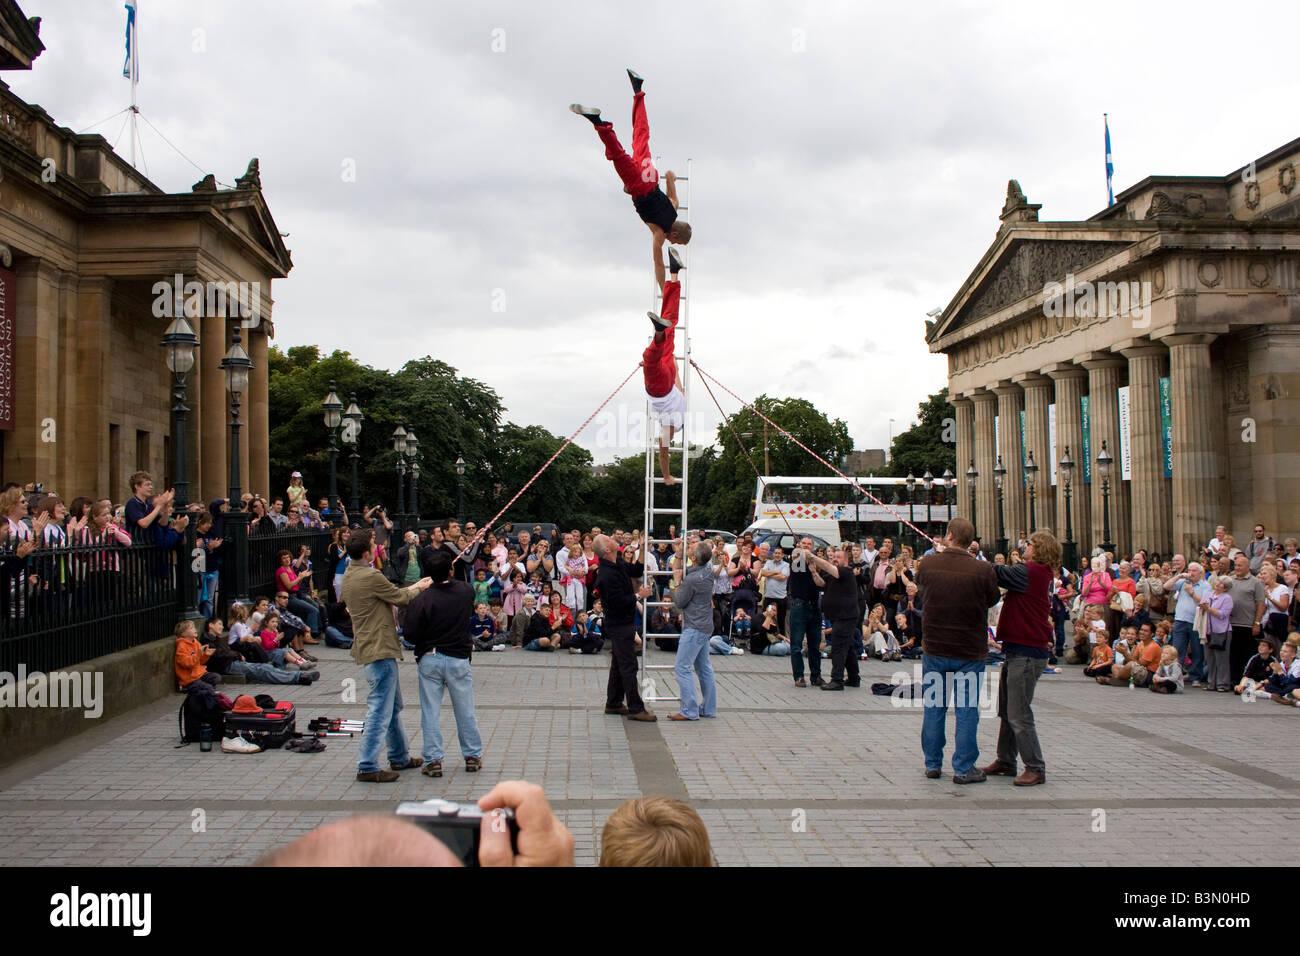 Acrobats street act at the Fringe Festival outside the National Gallery of Scotland, Edinburgh Scotland - Stock Image